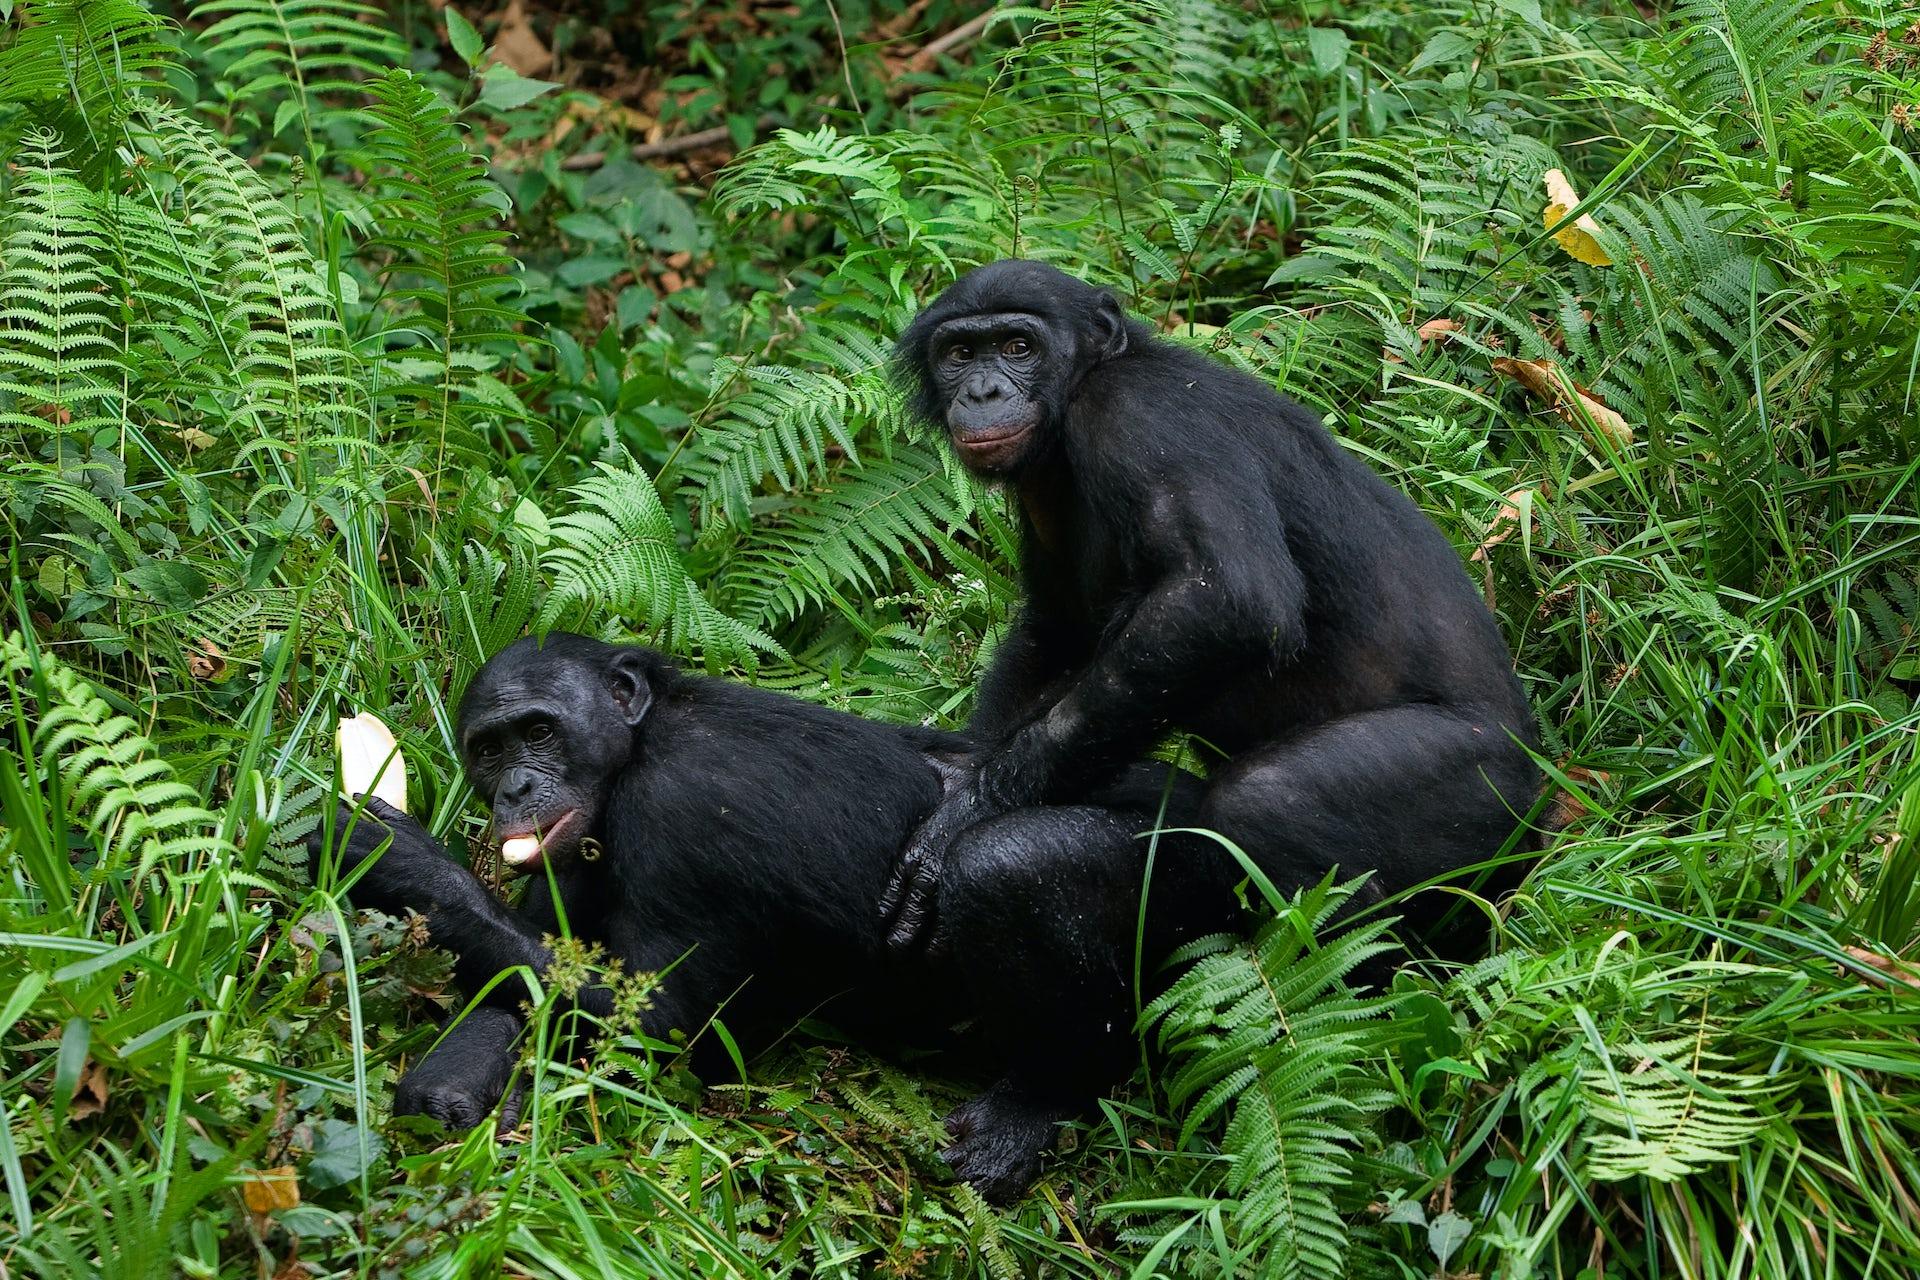 How big is a gorilla penis